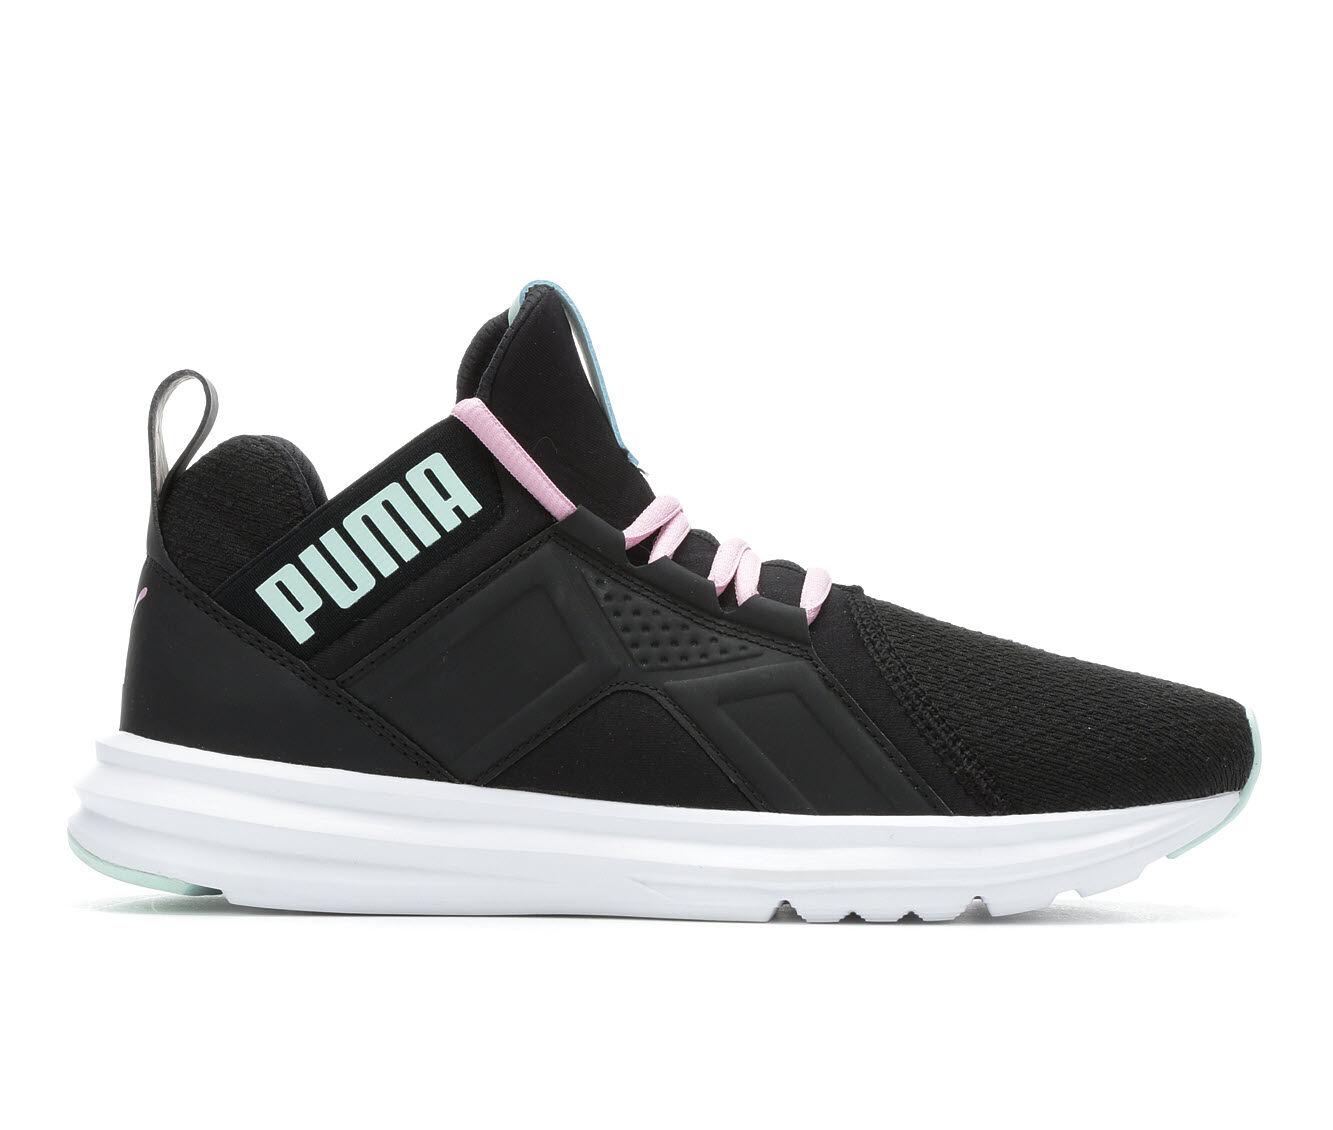 shop authentic Women's Puma Zenvo High Top Slip-On Sneakers Black/Aqua/Pink